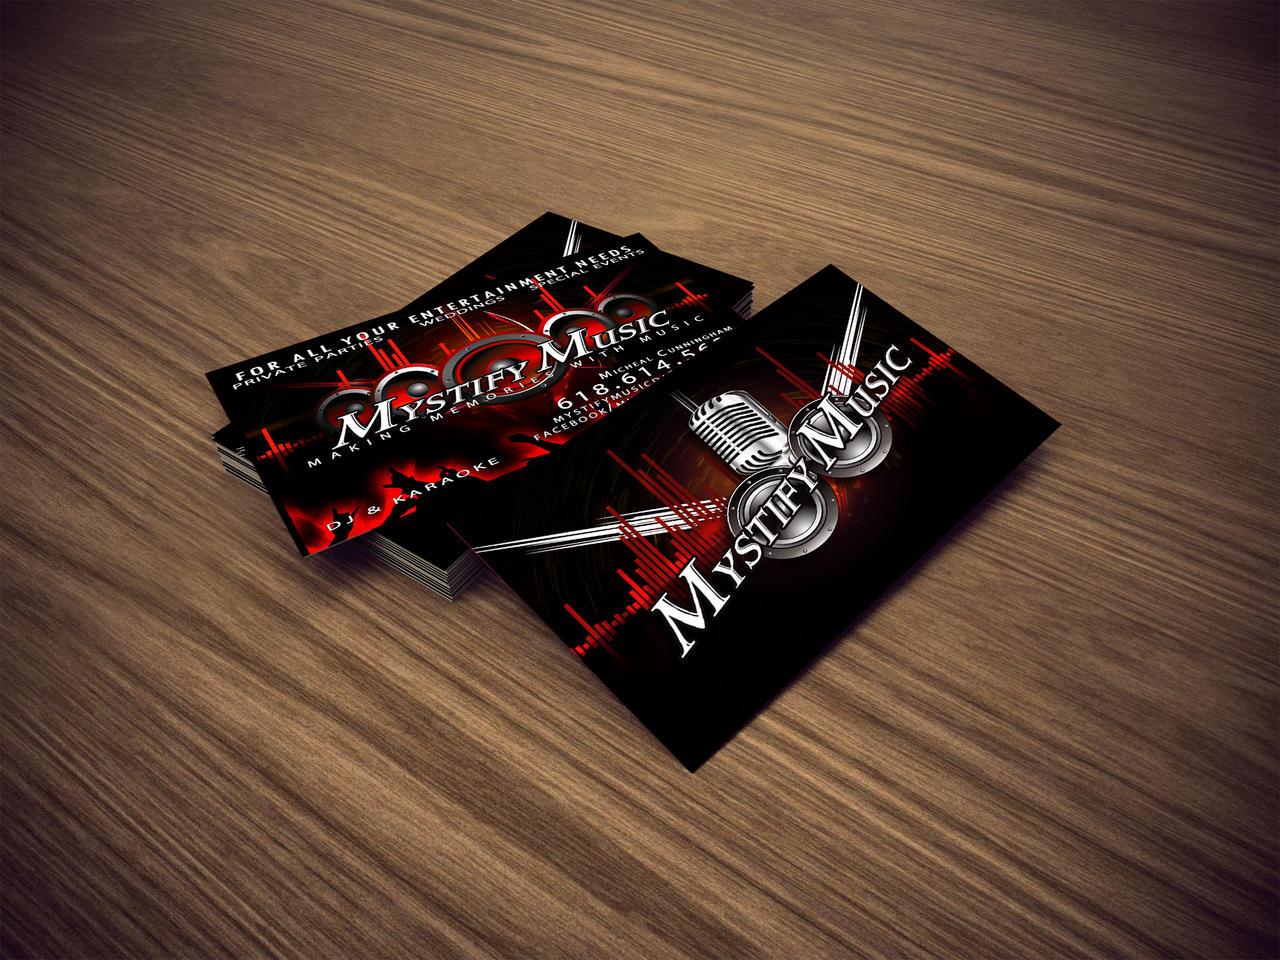 Mystify Music Business Cards by DigitalPhenom on DeviantArt